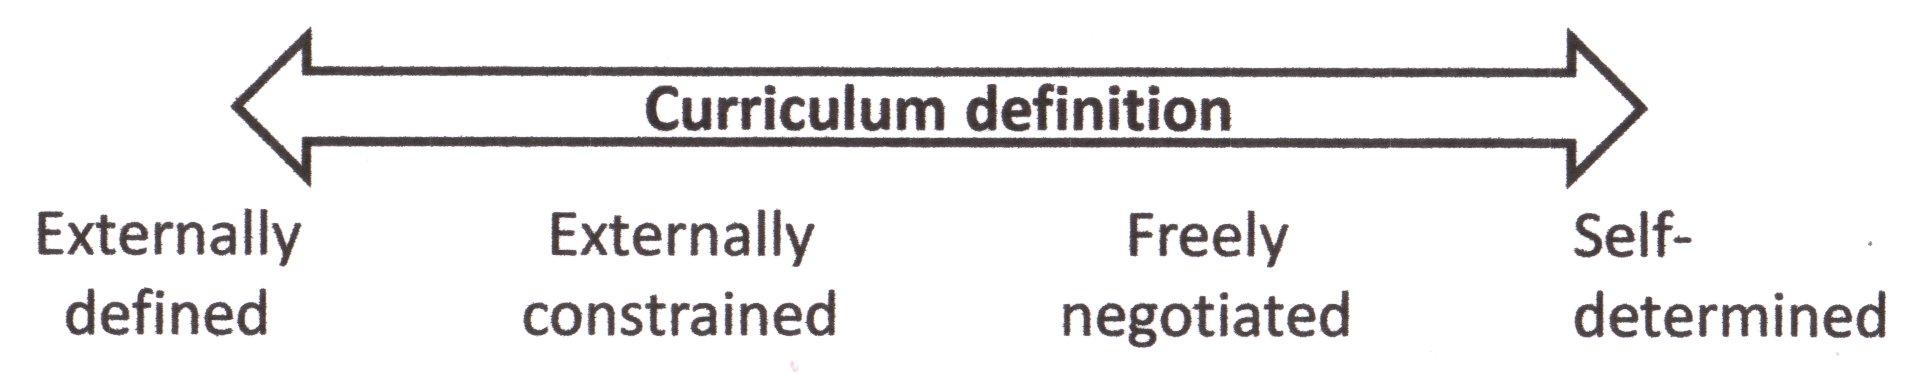 Curriculum definition dimension